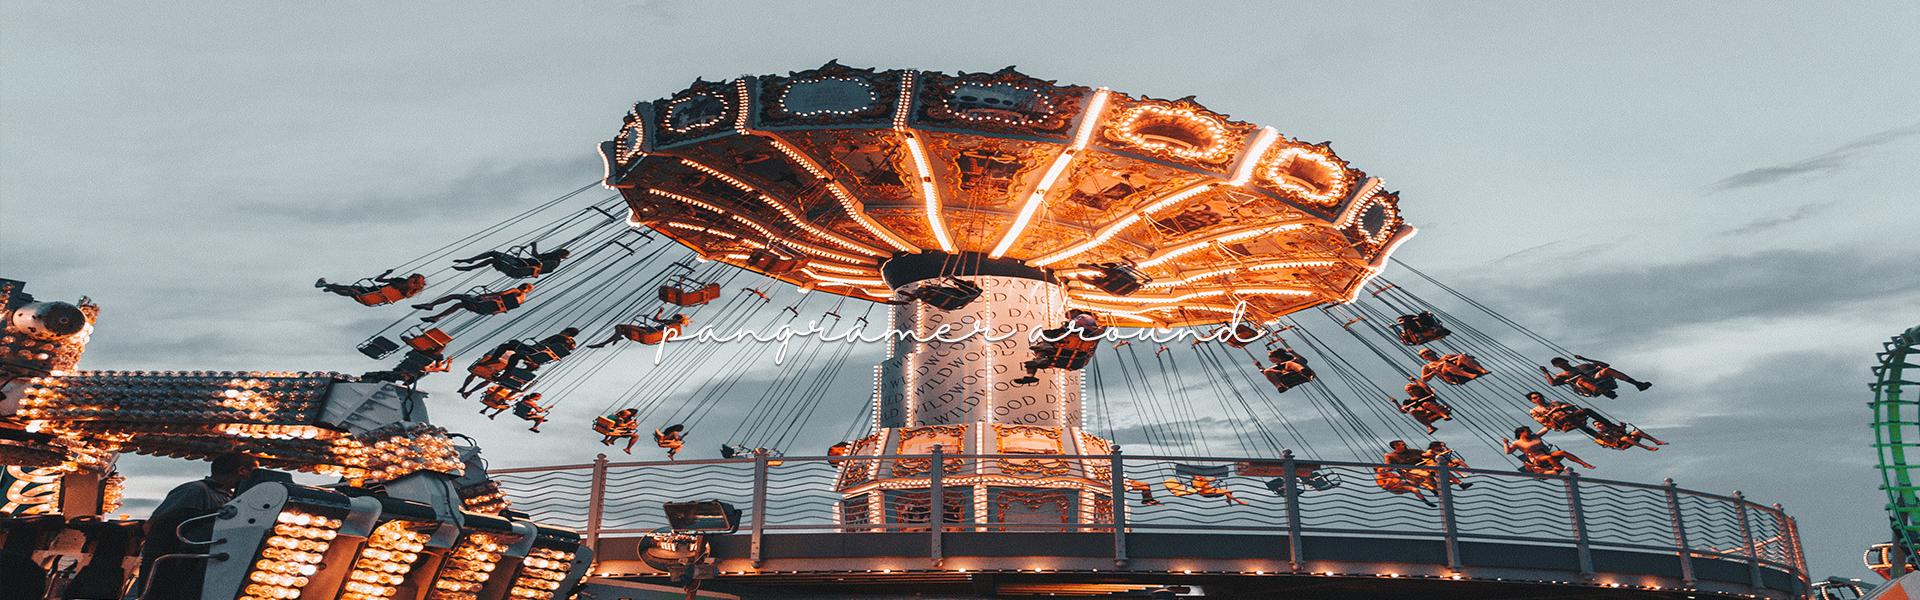 Carousel 03